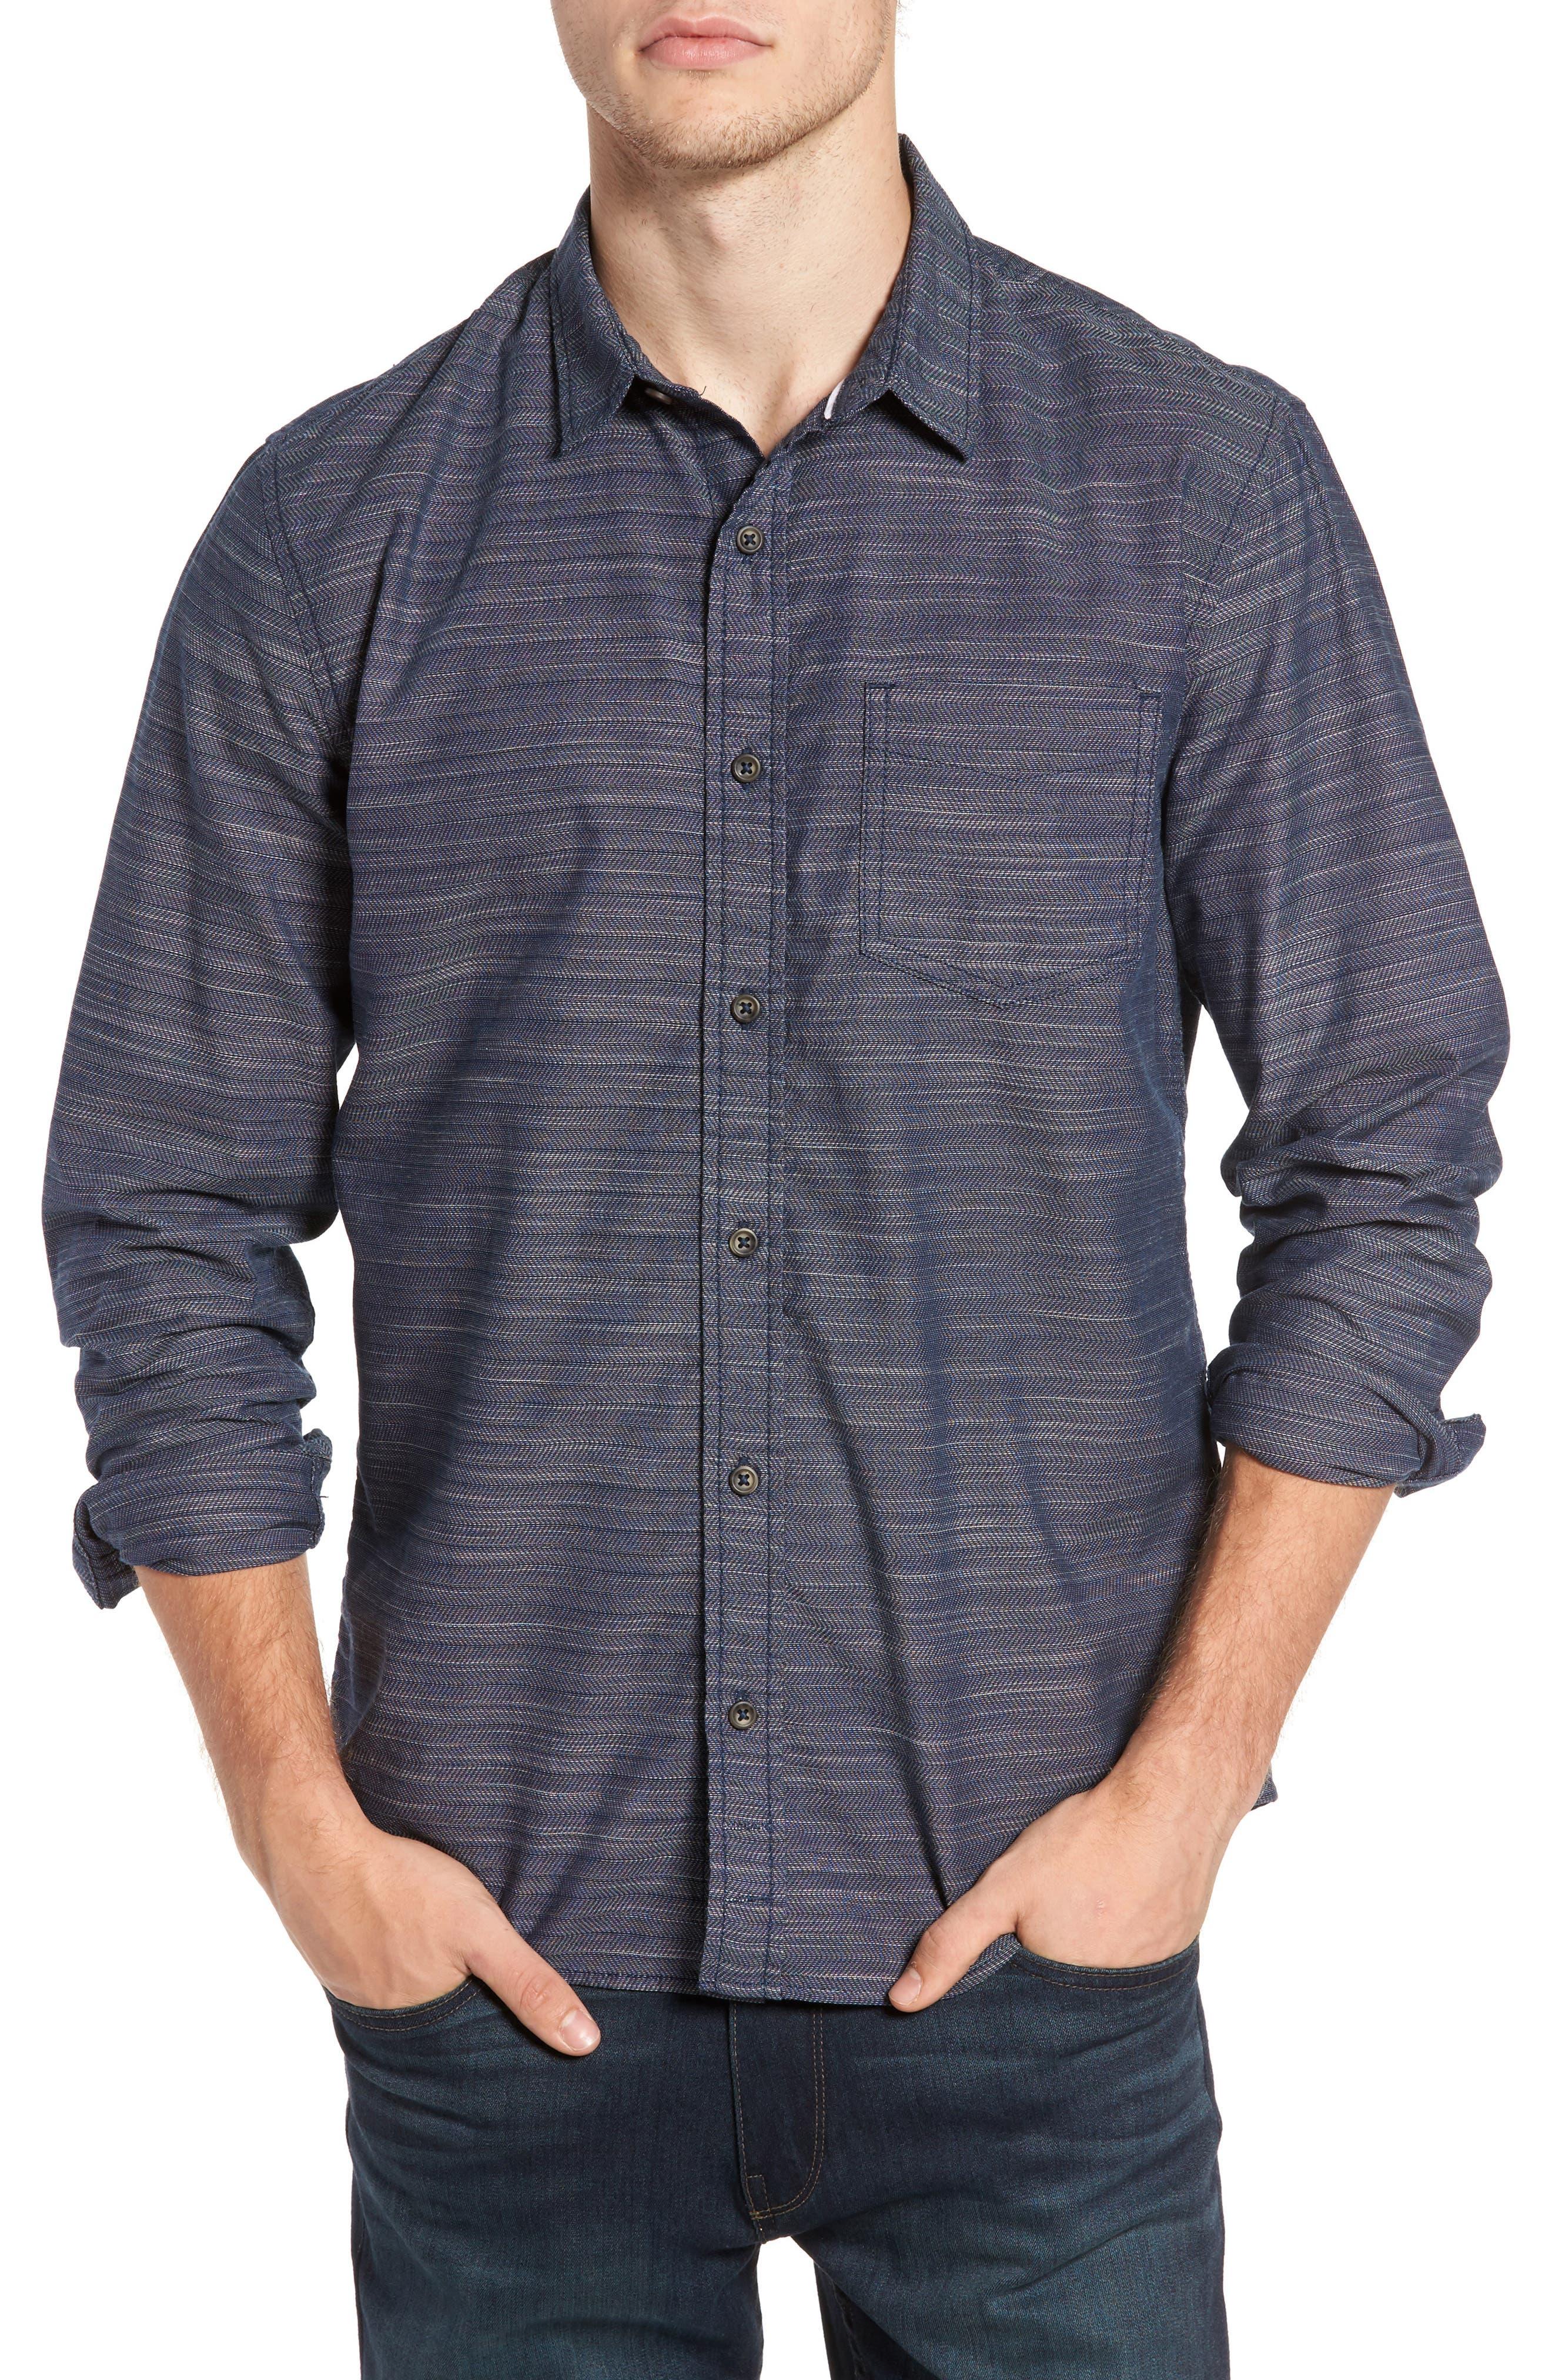 Herringbone Chambray Shirt,                             Main thumbnail 1, color,                             Navy Charcoal Herringbone